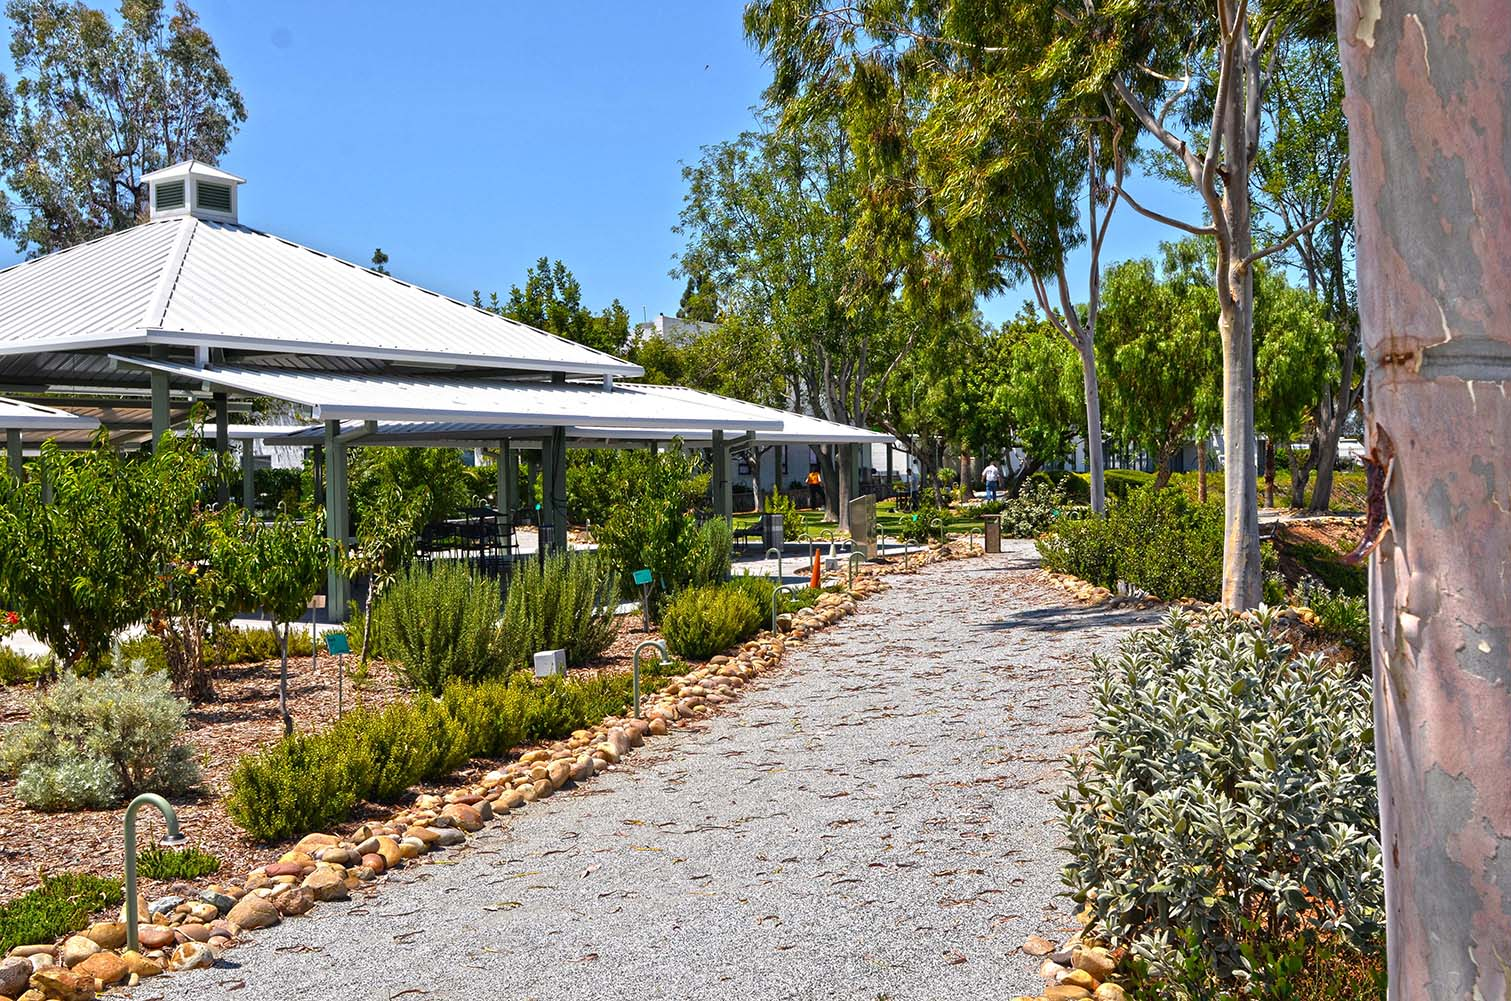 pavilion and path